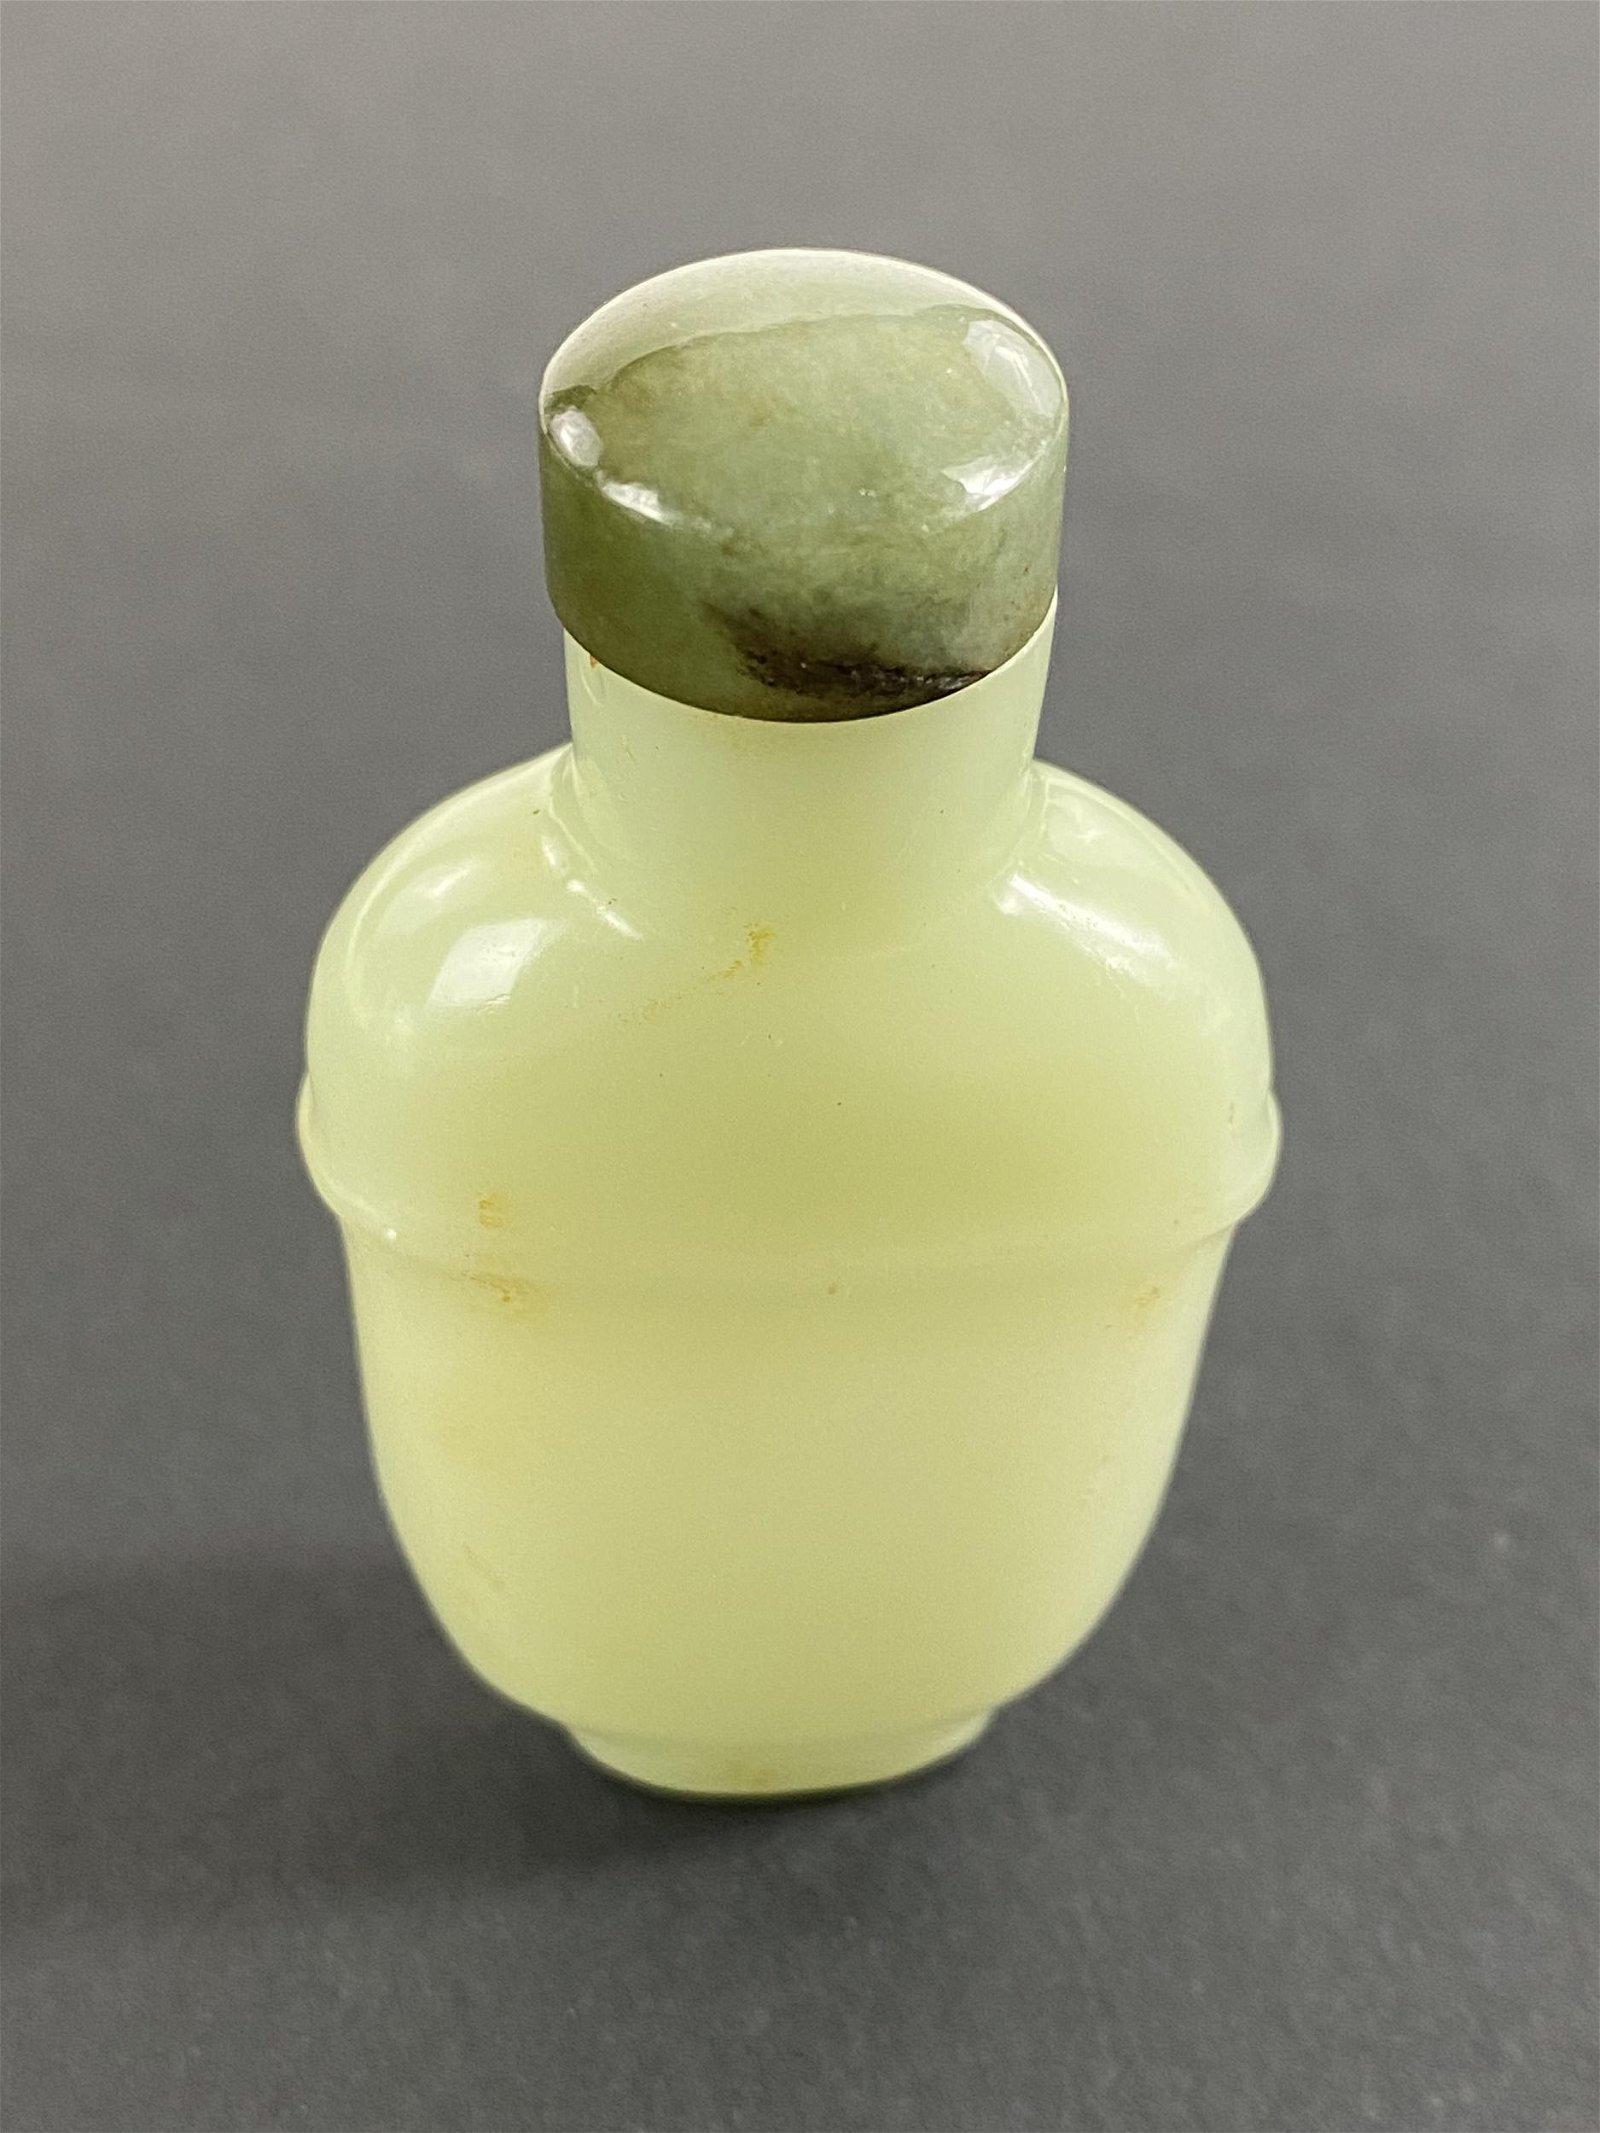 A Celadon Jade Chinese Diminutive Snuff Bottle